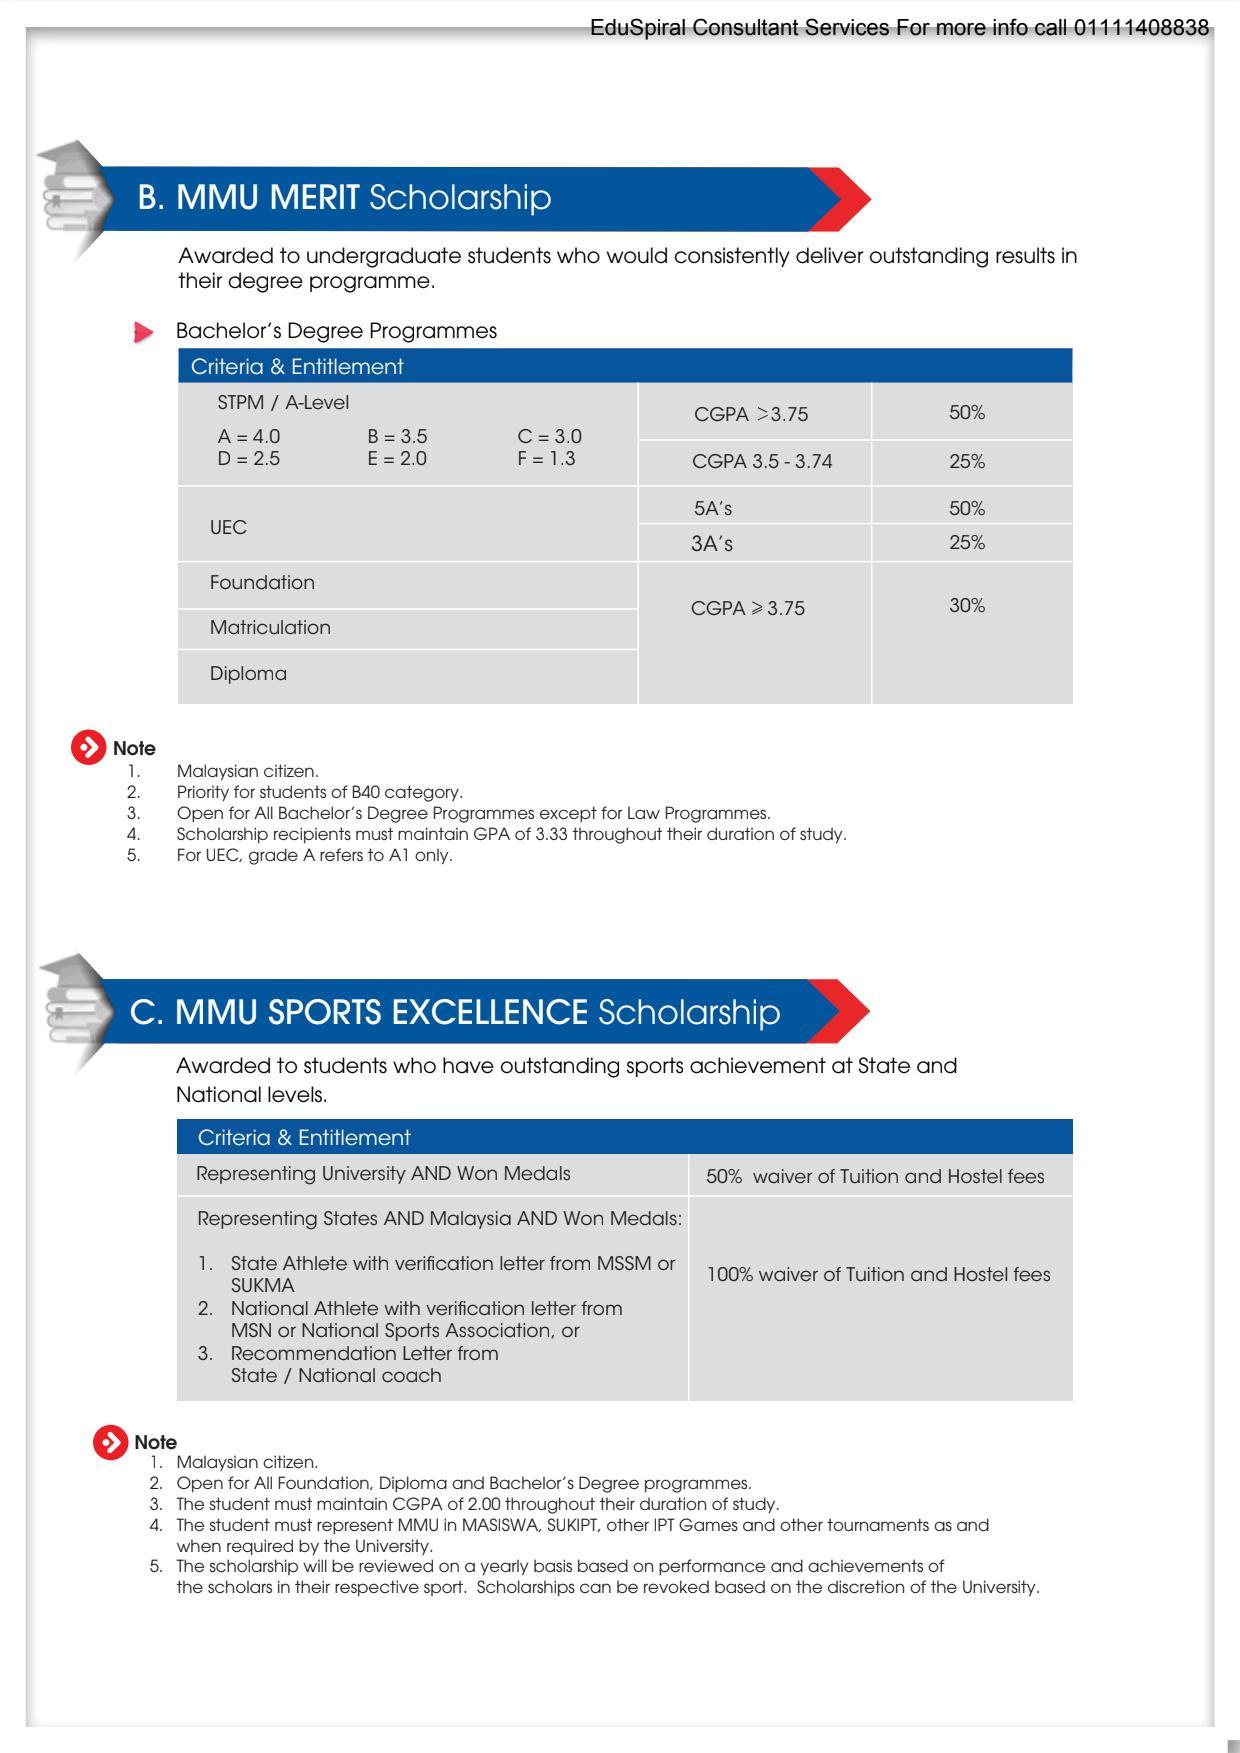 Multimedia University (MMU) 2021 Scholarship Details